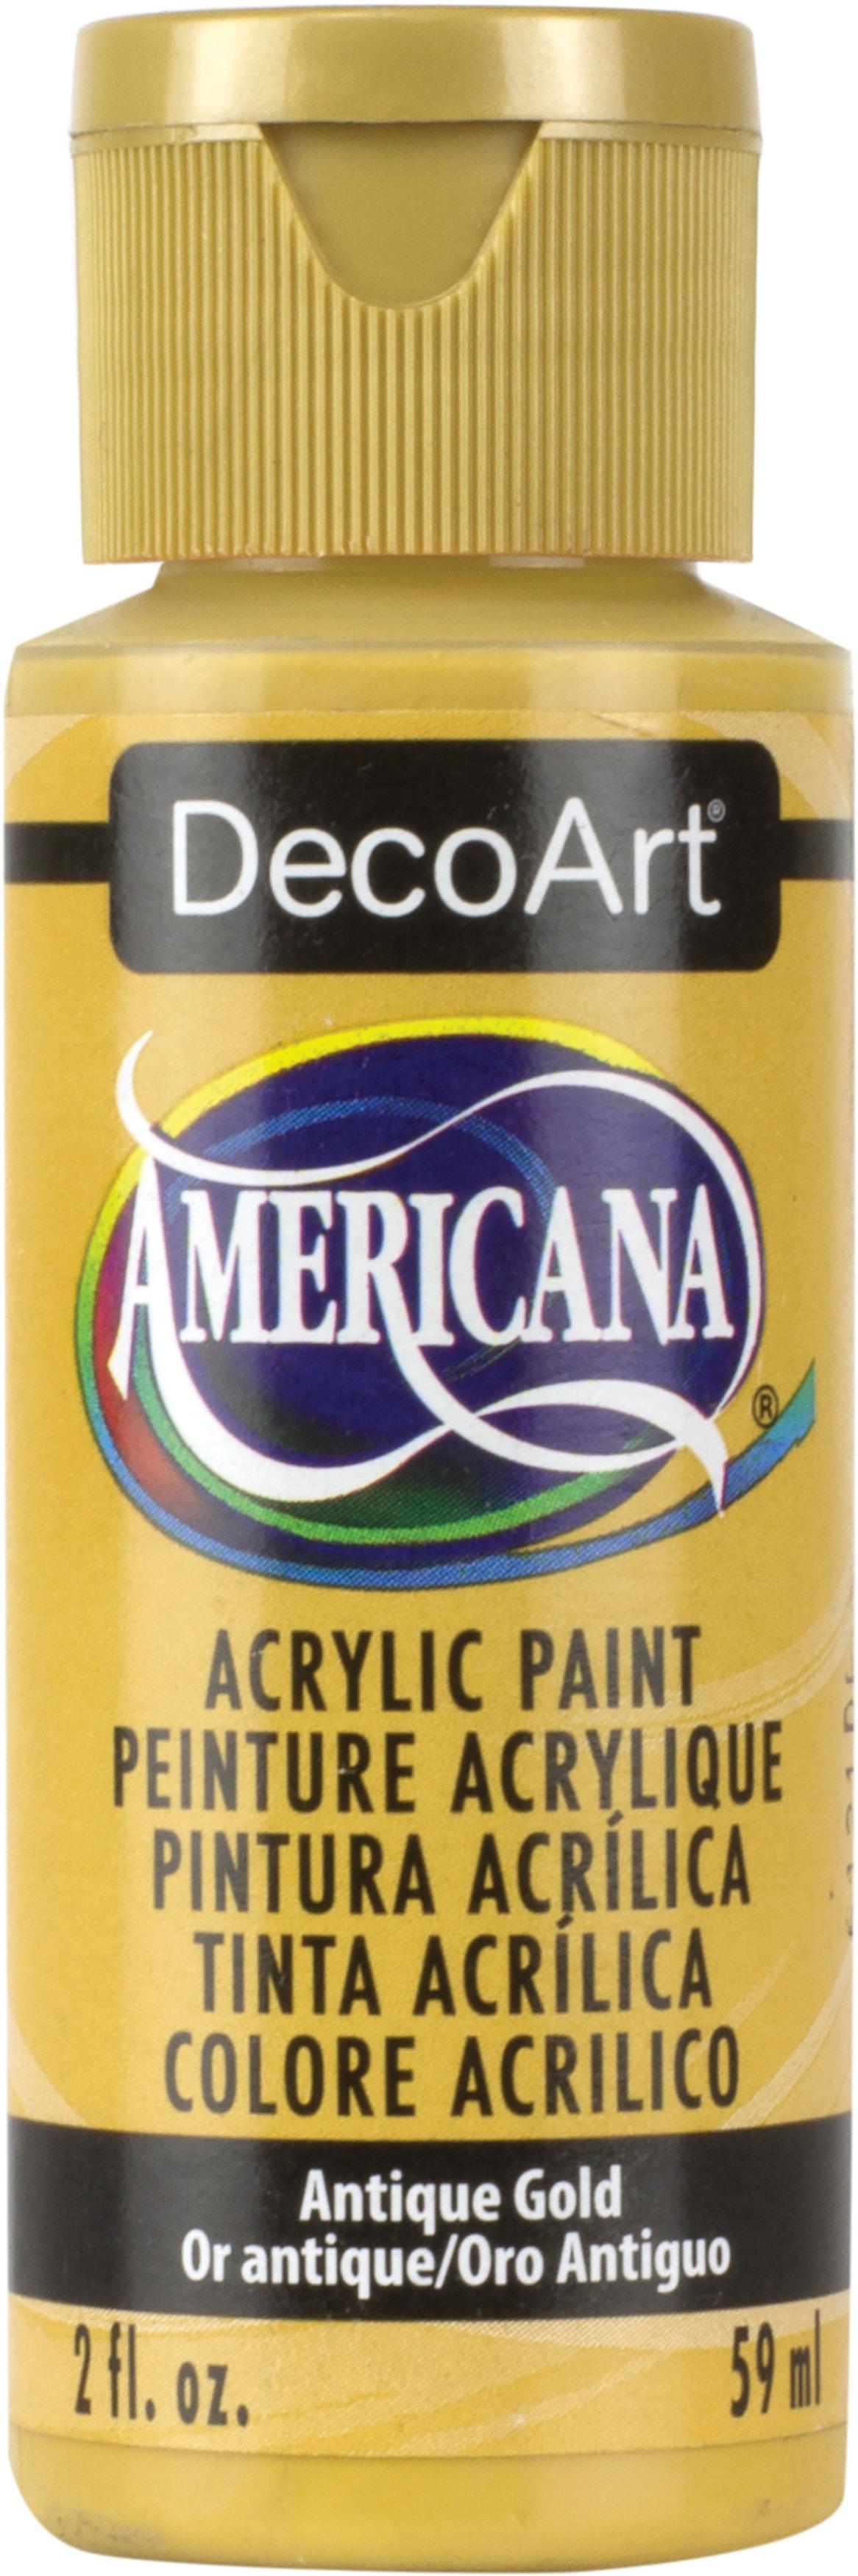 DecoArt Americana Acrylic Paint, 2-Ounce, Antique Gold